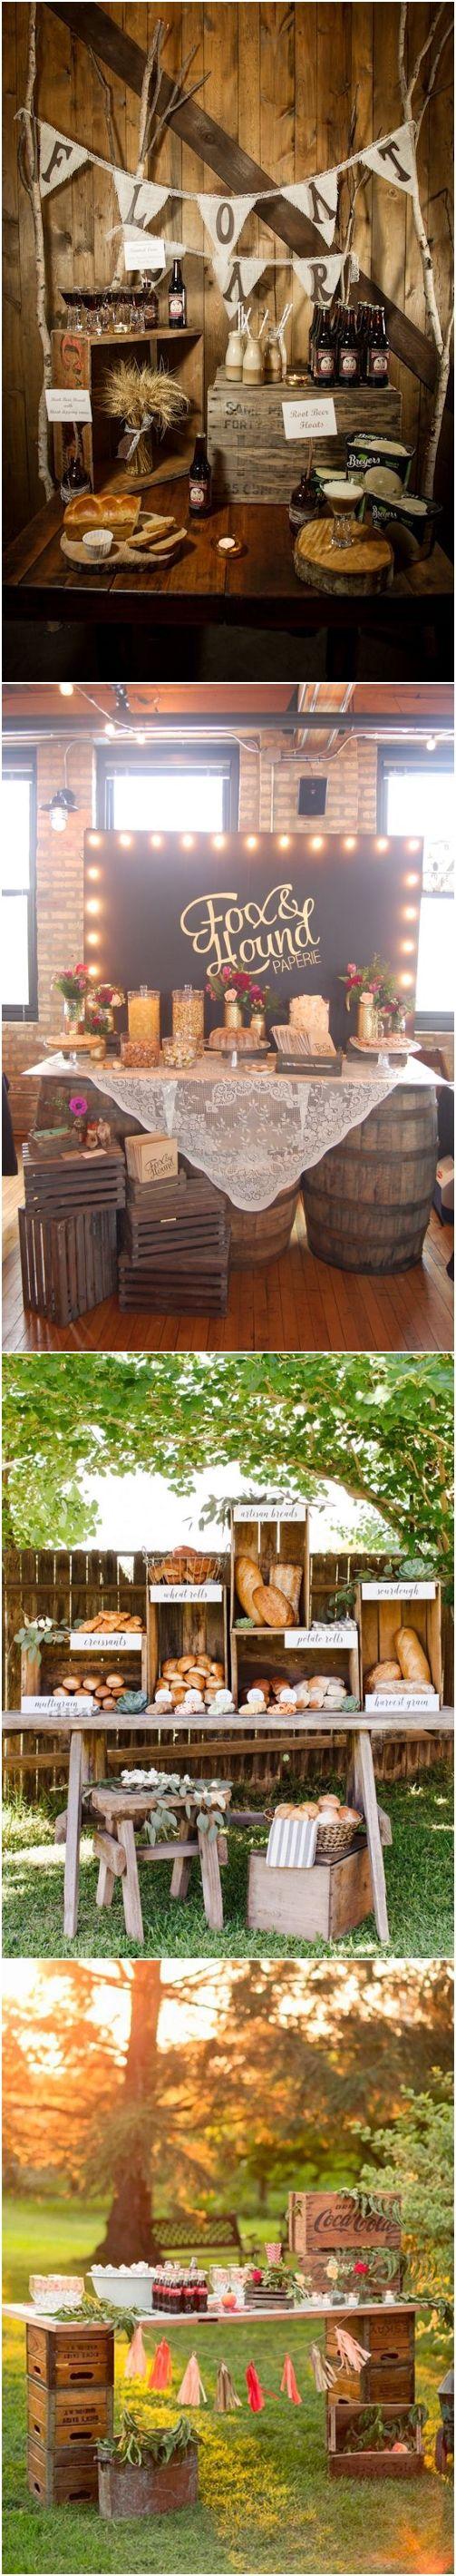 Rustic country wooden crate wedding food bar decor ideas / http://www.deerpearlflowers.com/rustic-woodsy-wedding-trend-2018-wooden-crates/ #rusticweddings #countryweddings